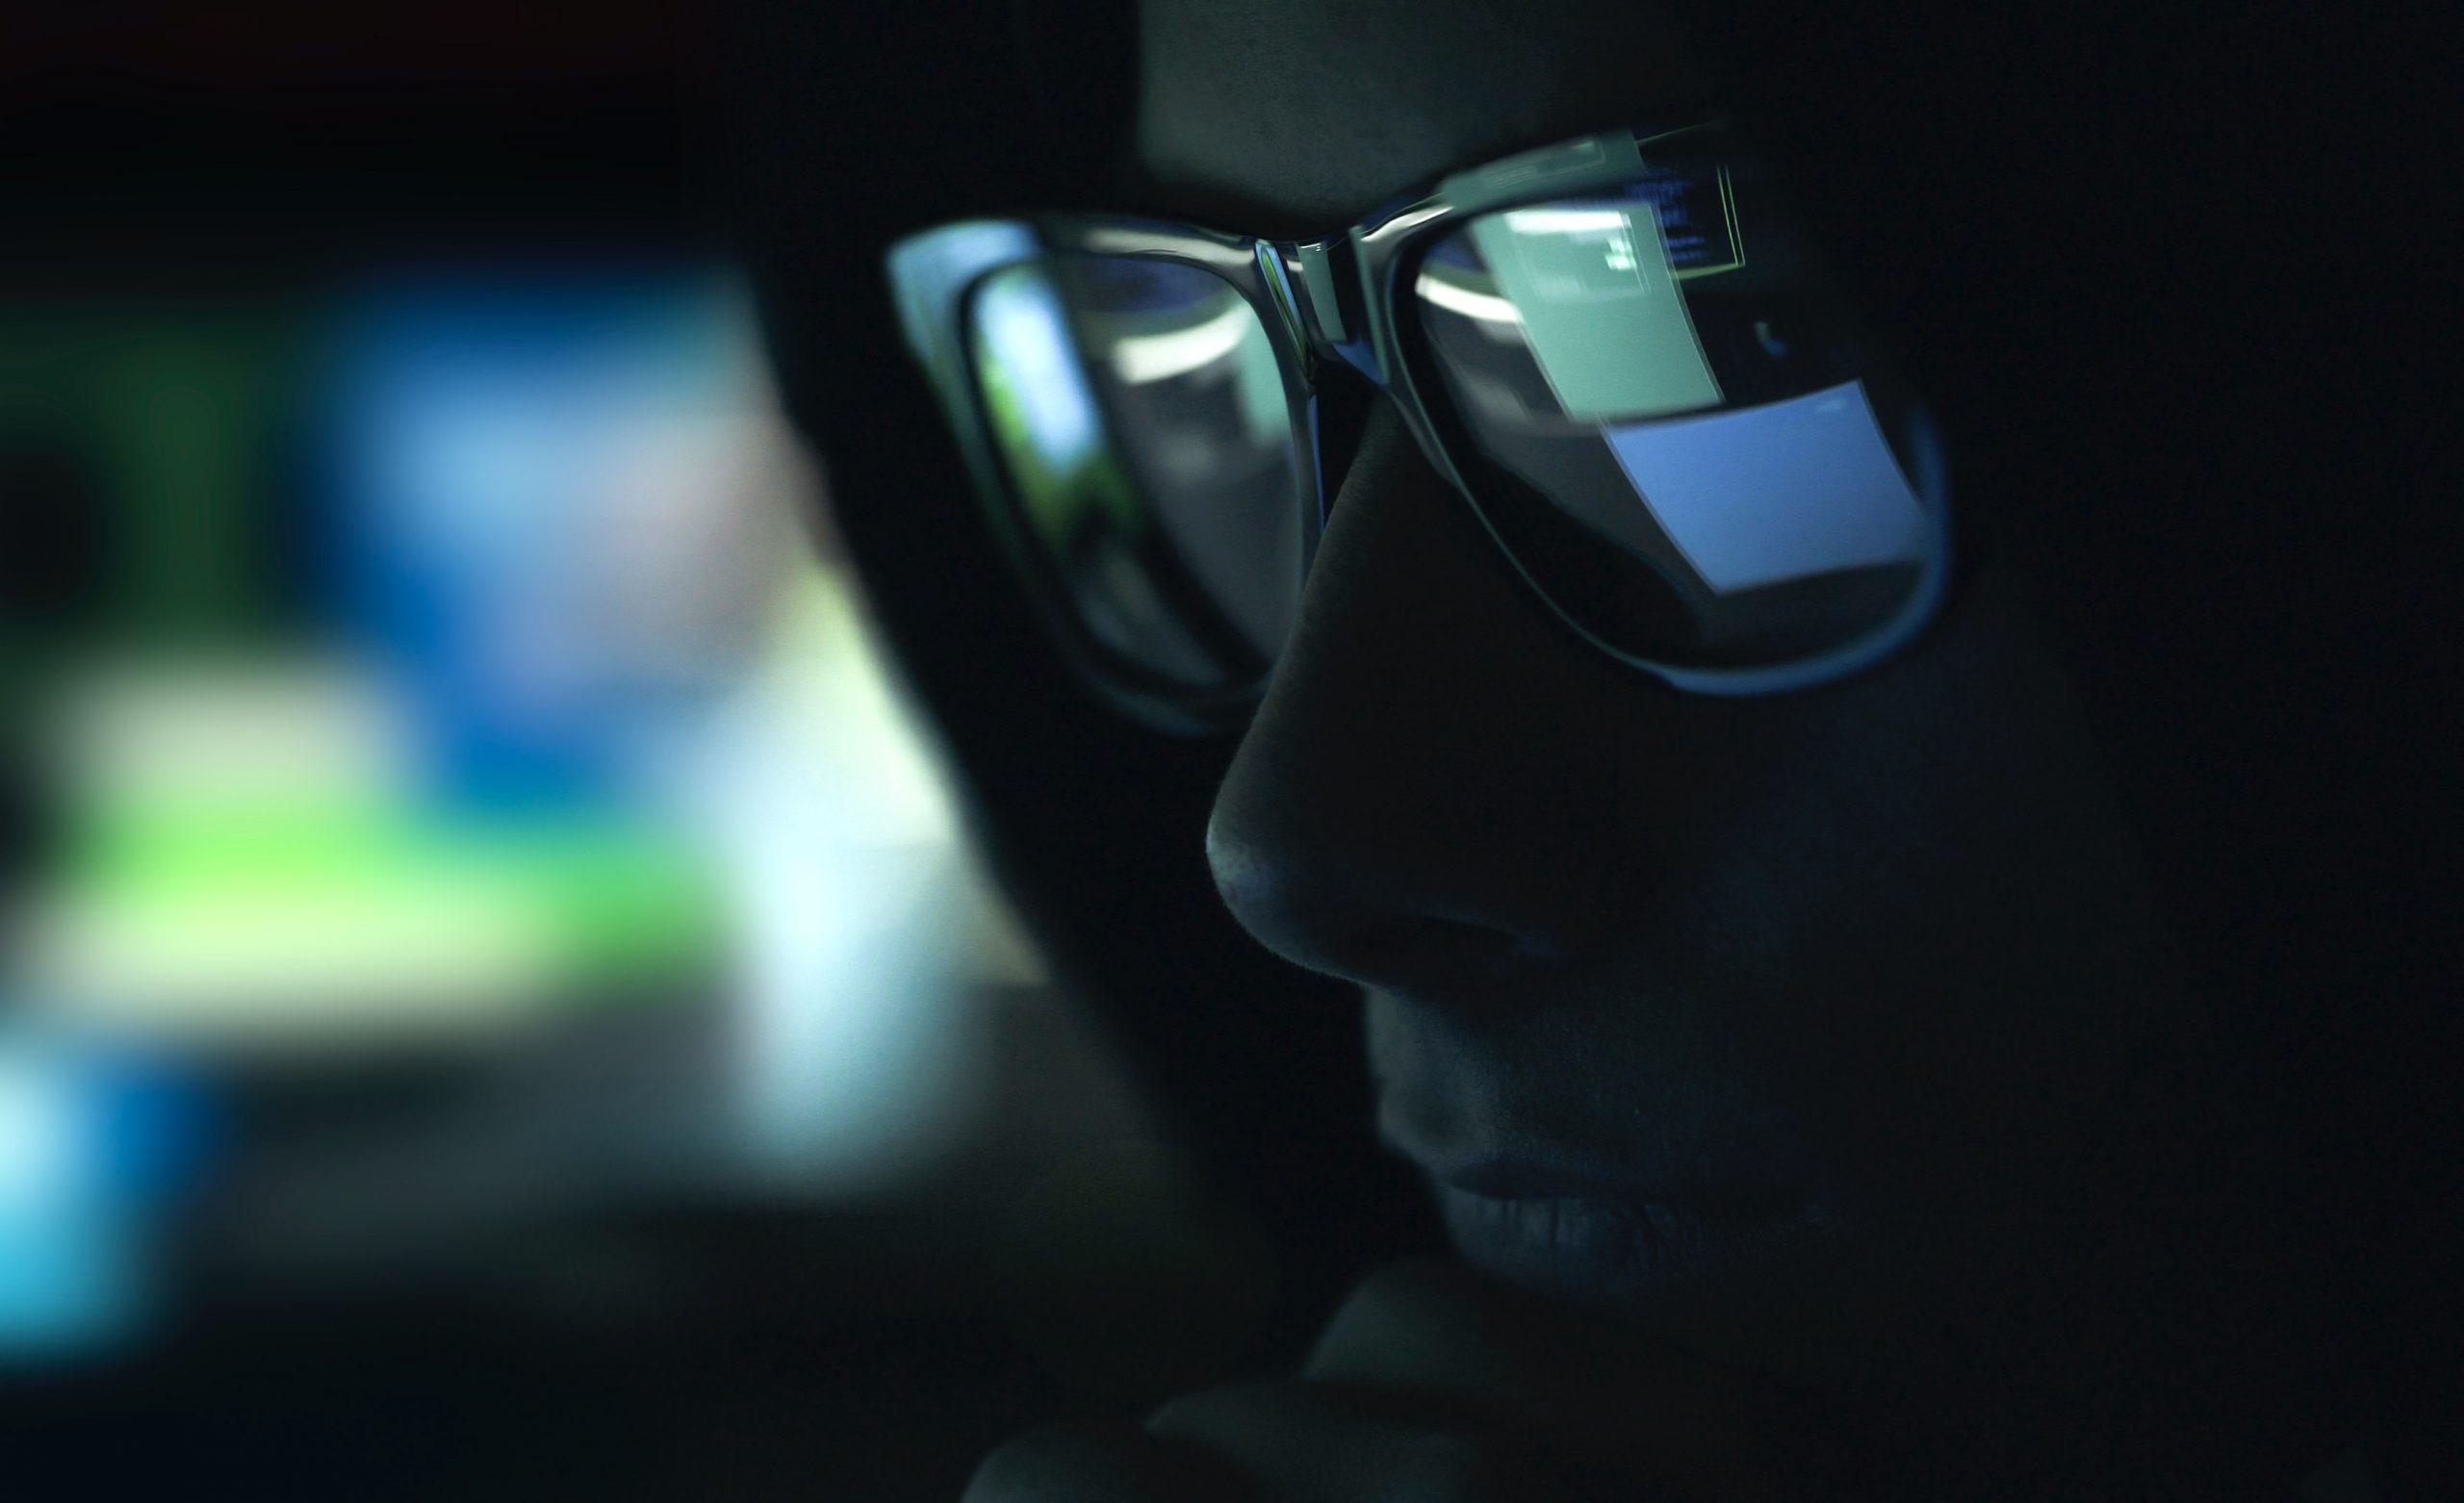 nerd-hacker-with-glasses-in-the-dark-Z632G4Q